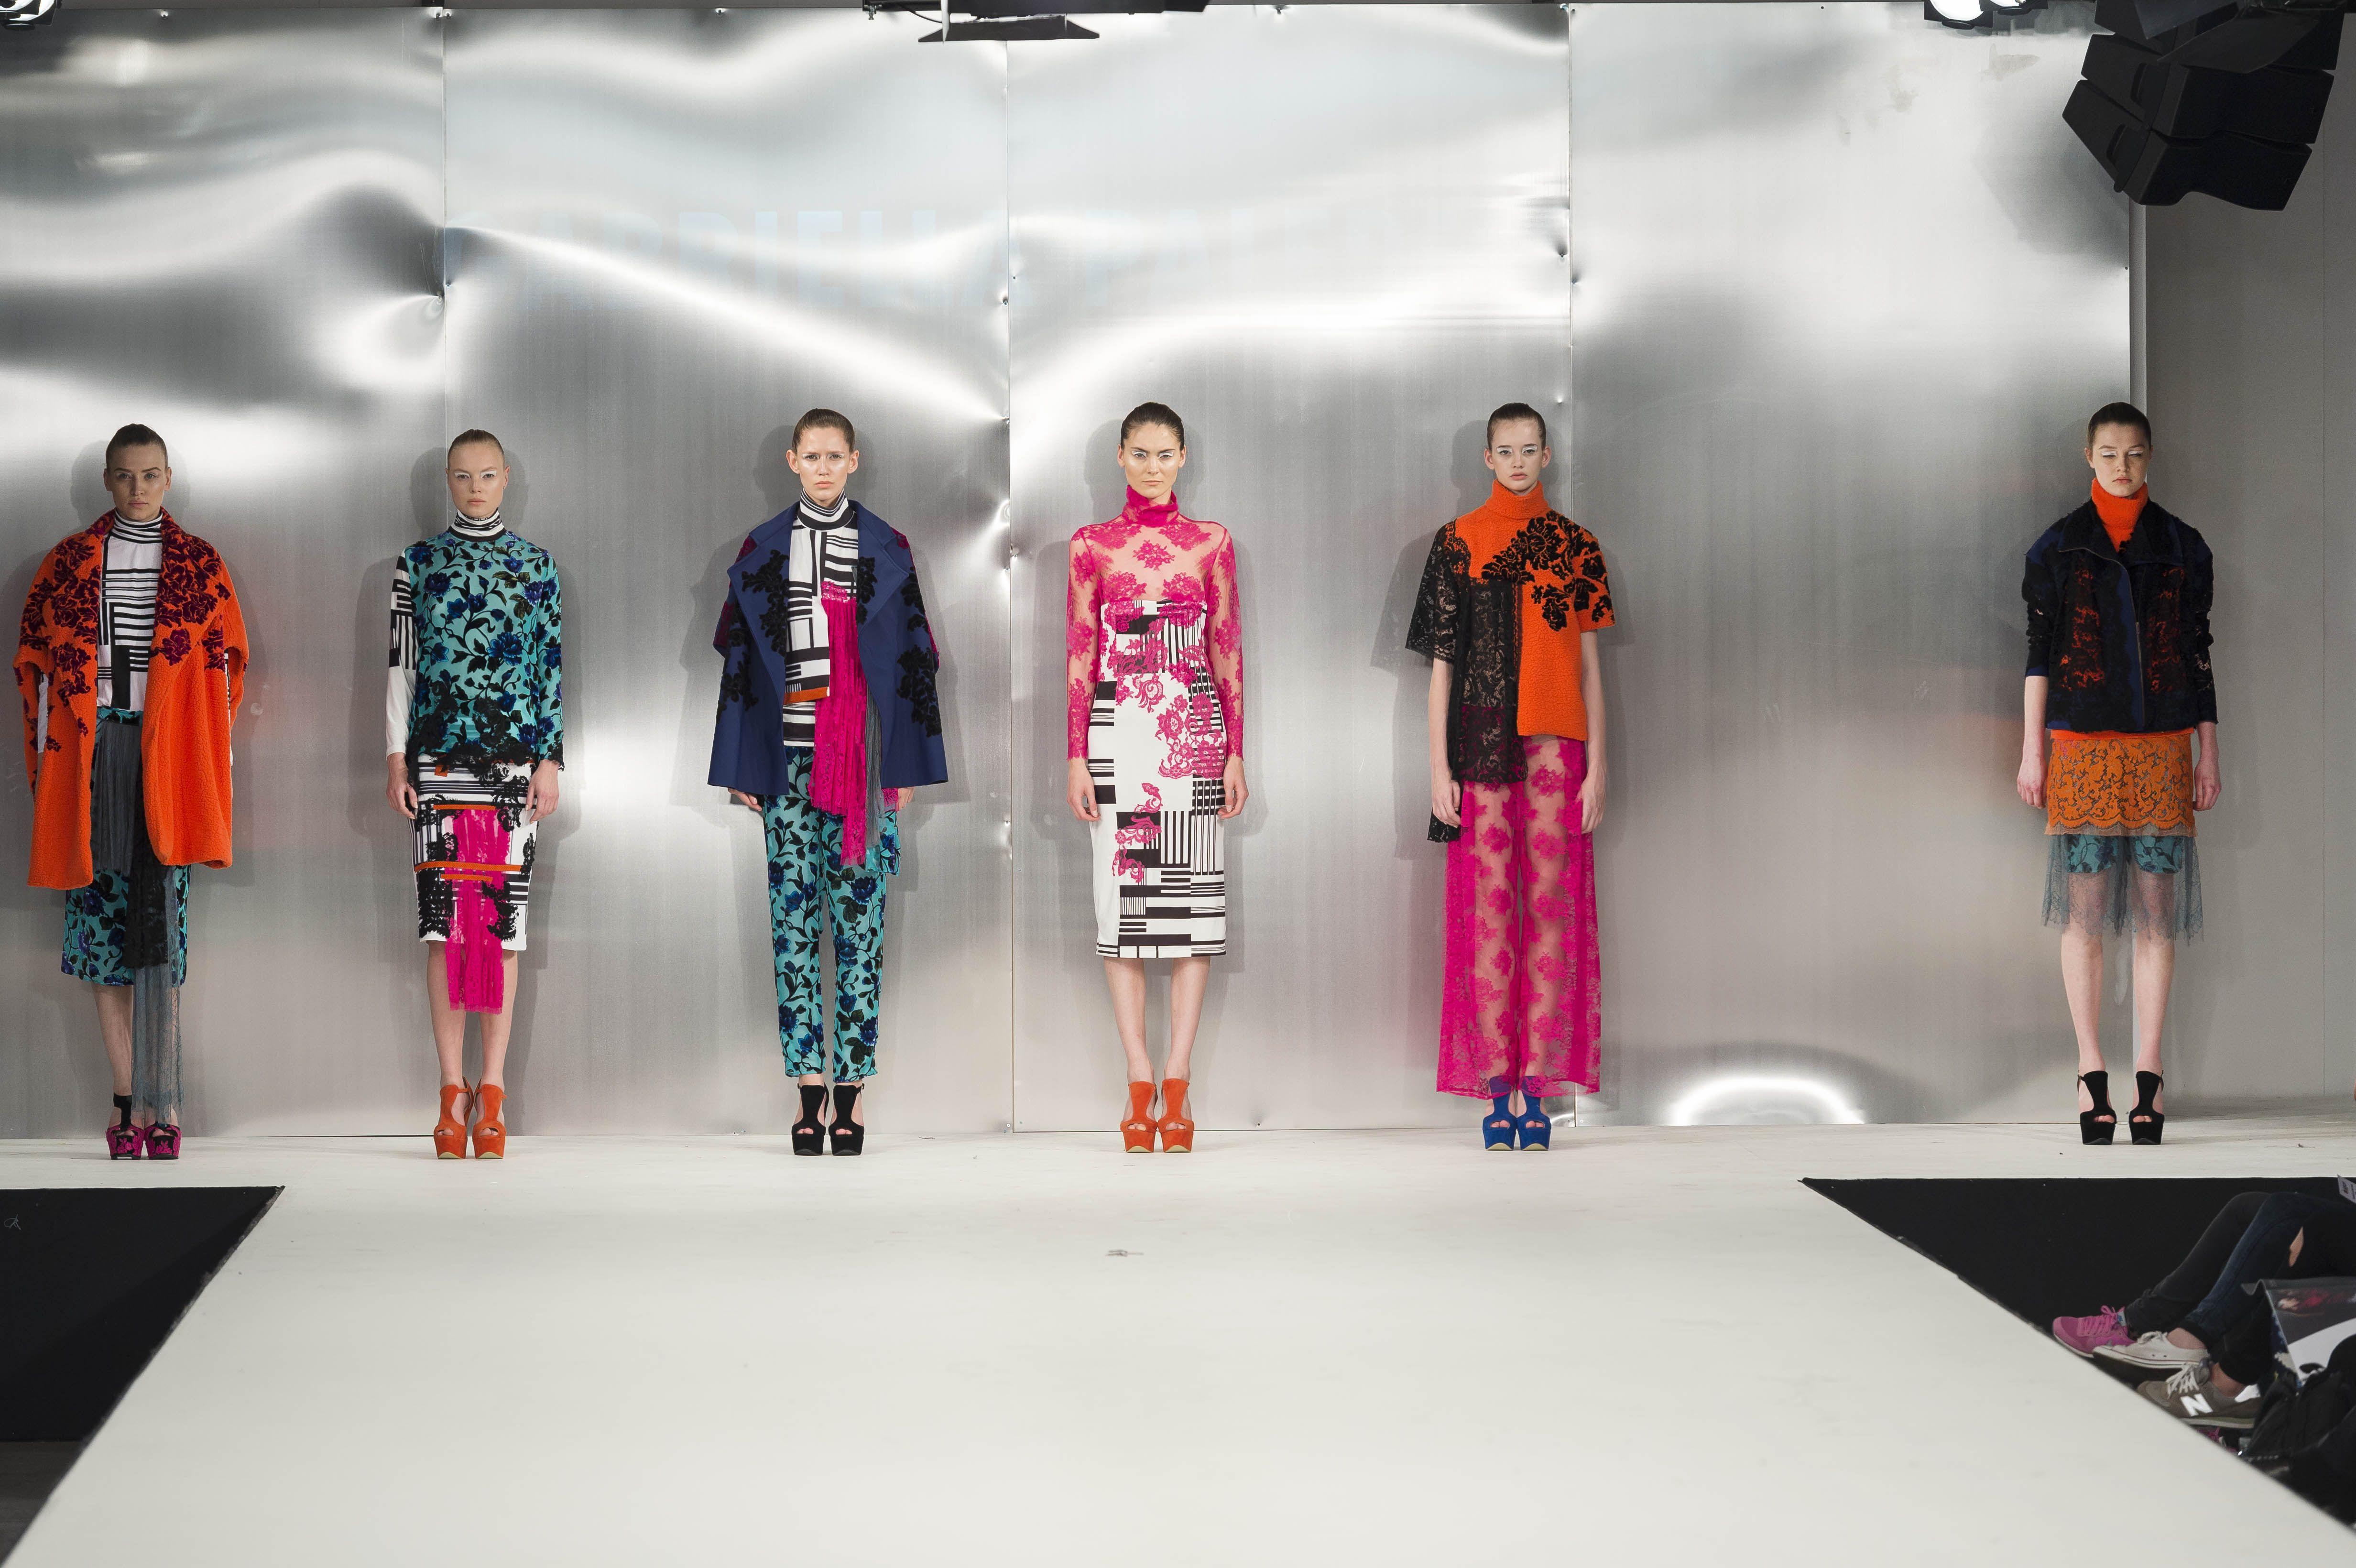 Designs by De Montfort University DMU Fashion Design